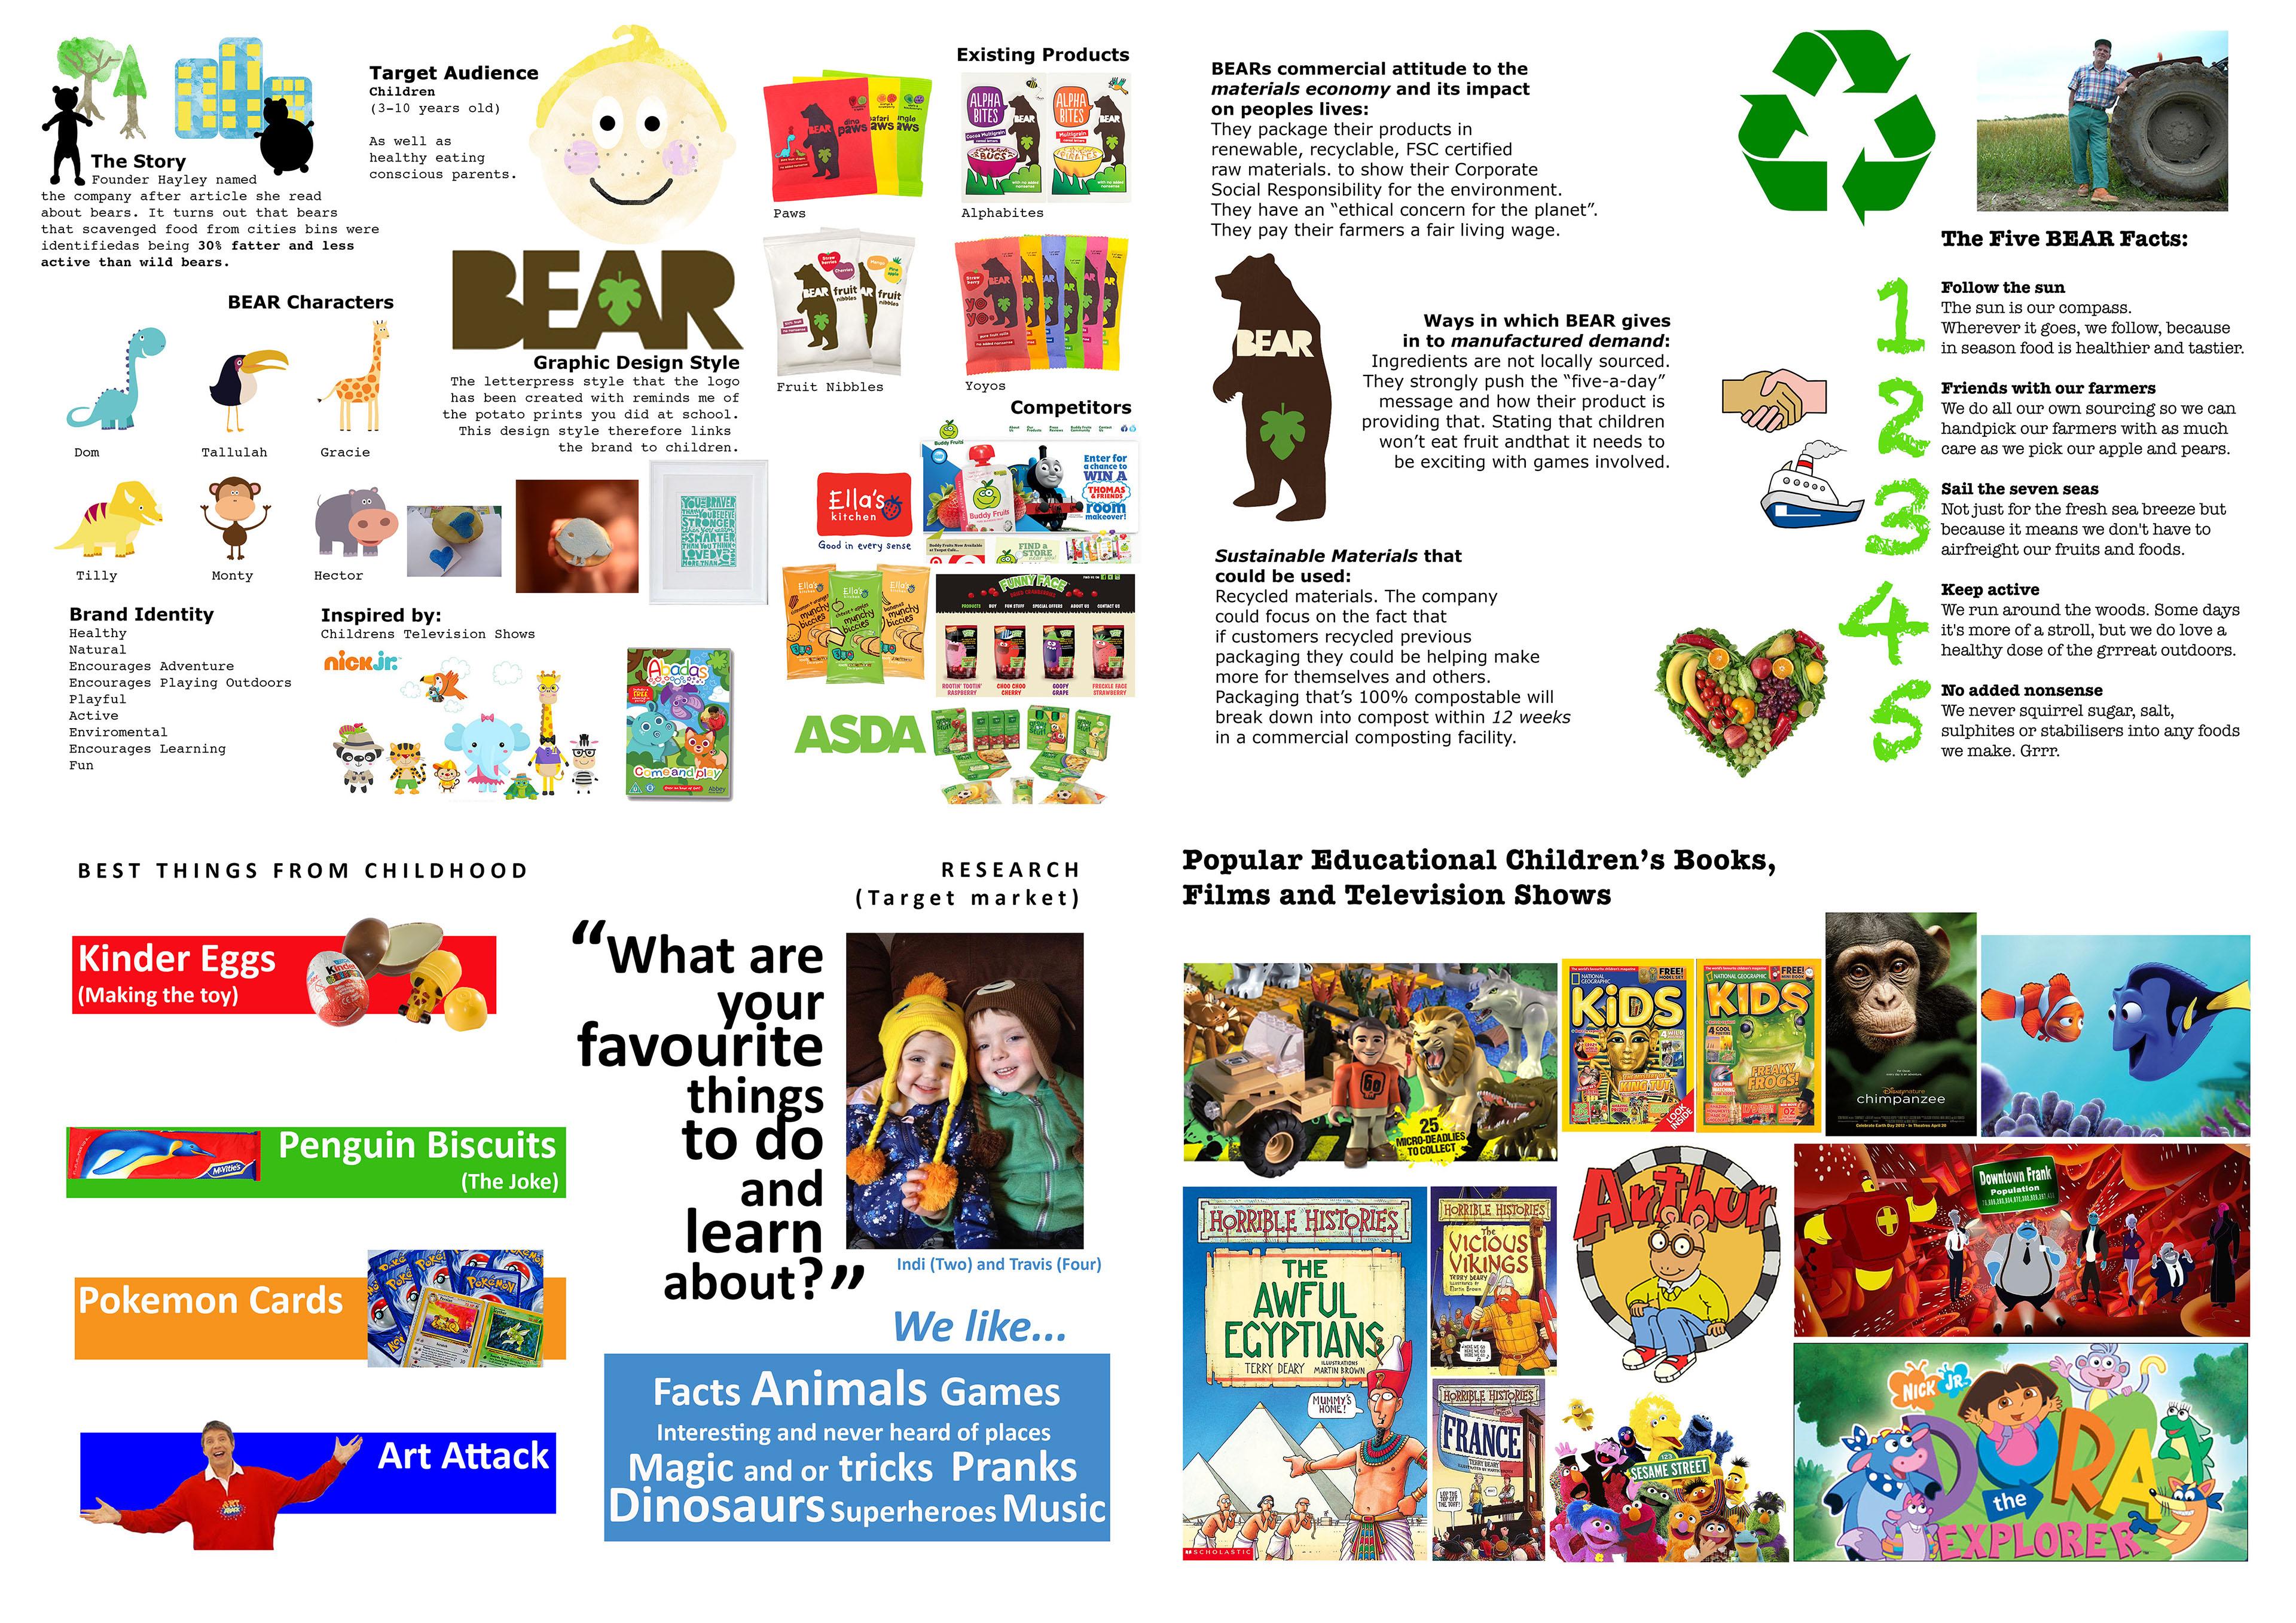 Amy MacGillivray - BEAR Cereal Box Design